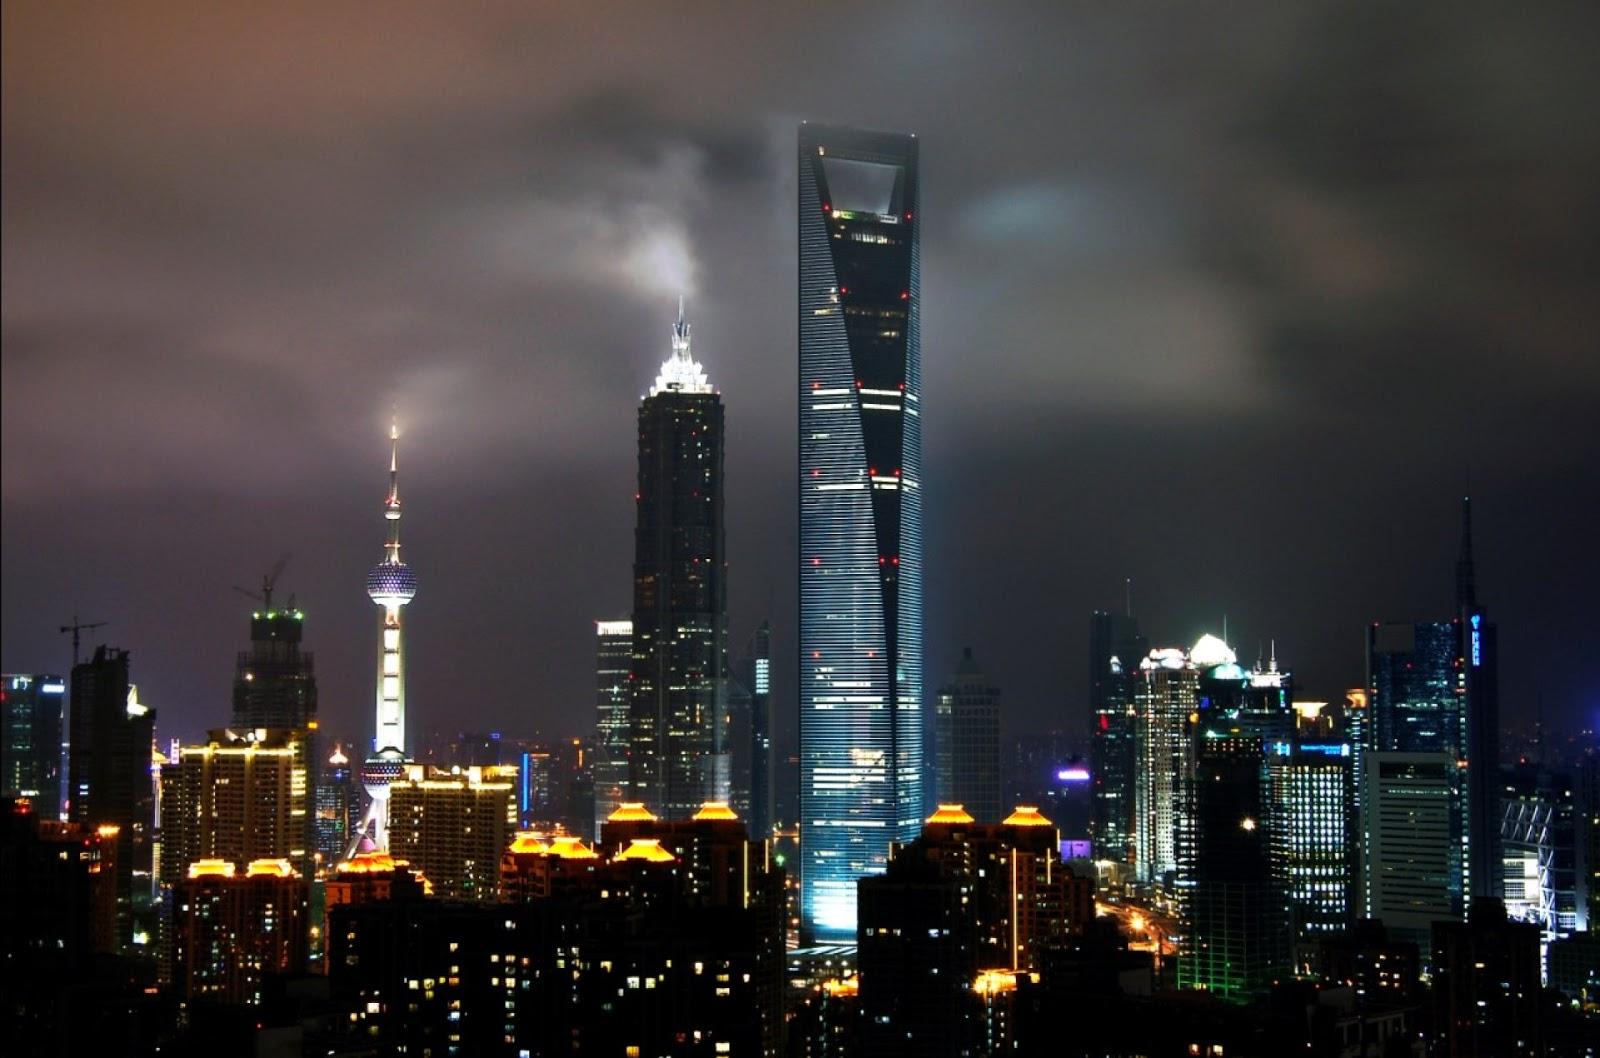 Ashley Wallpaper: Shanghai Skyline All Type Hd Wallpapers